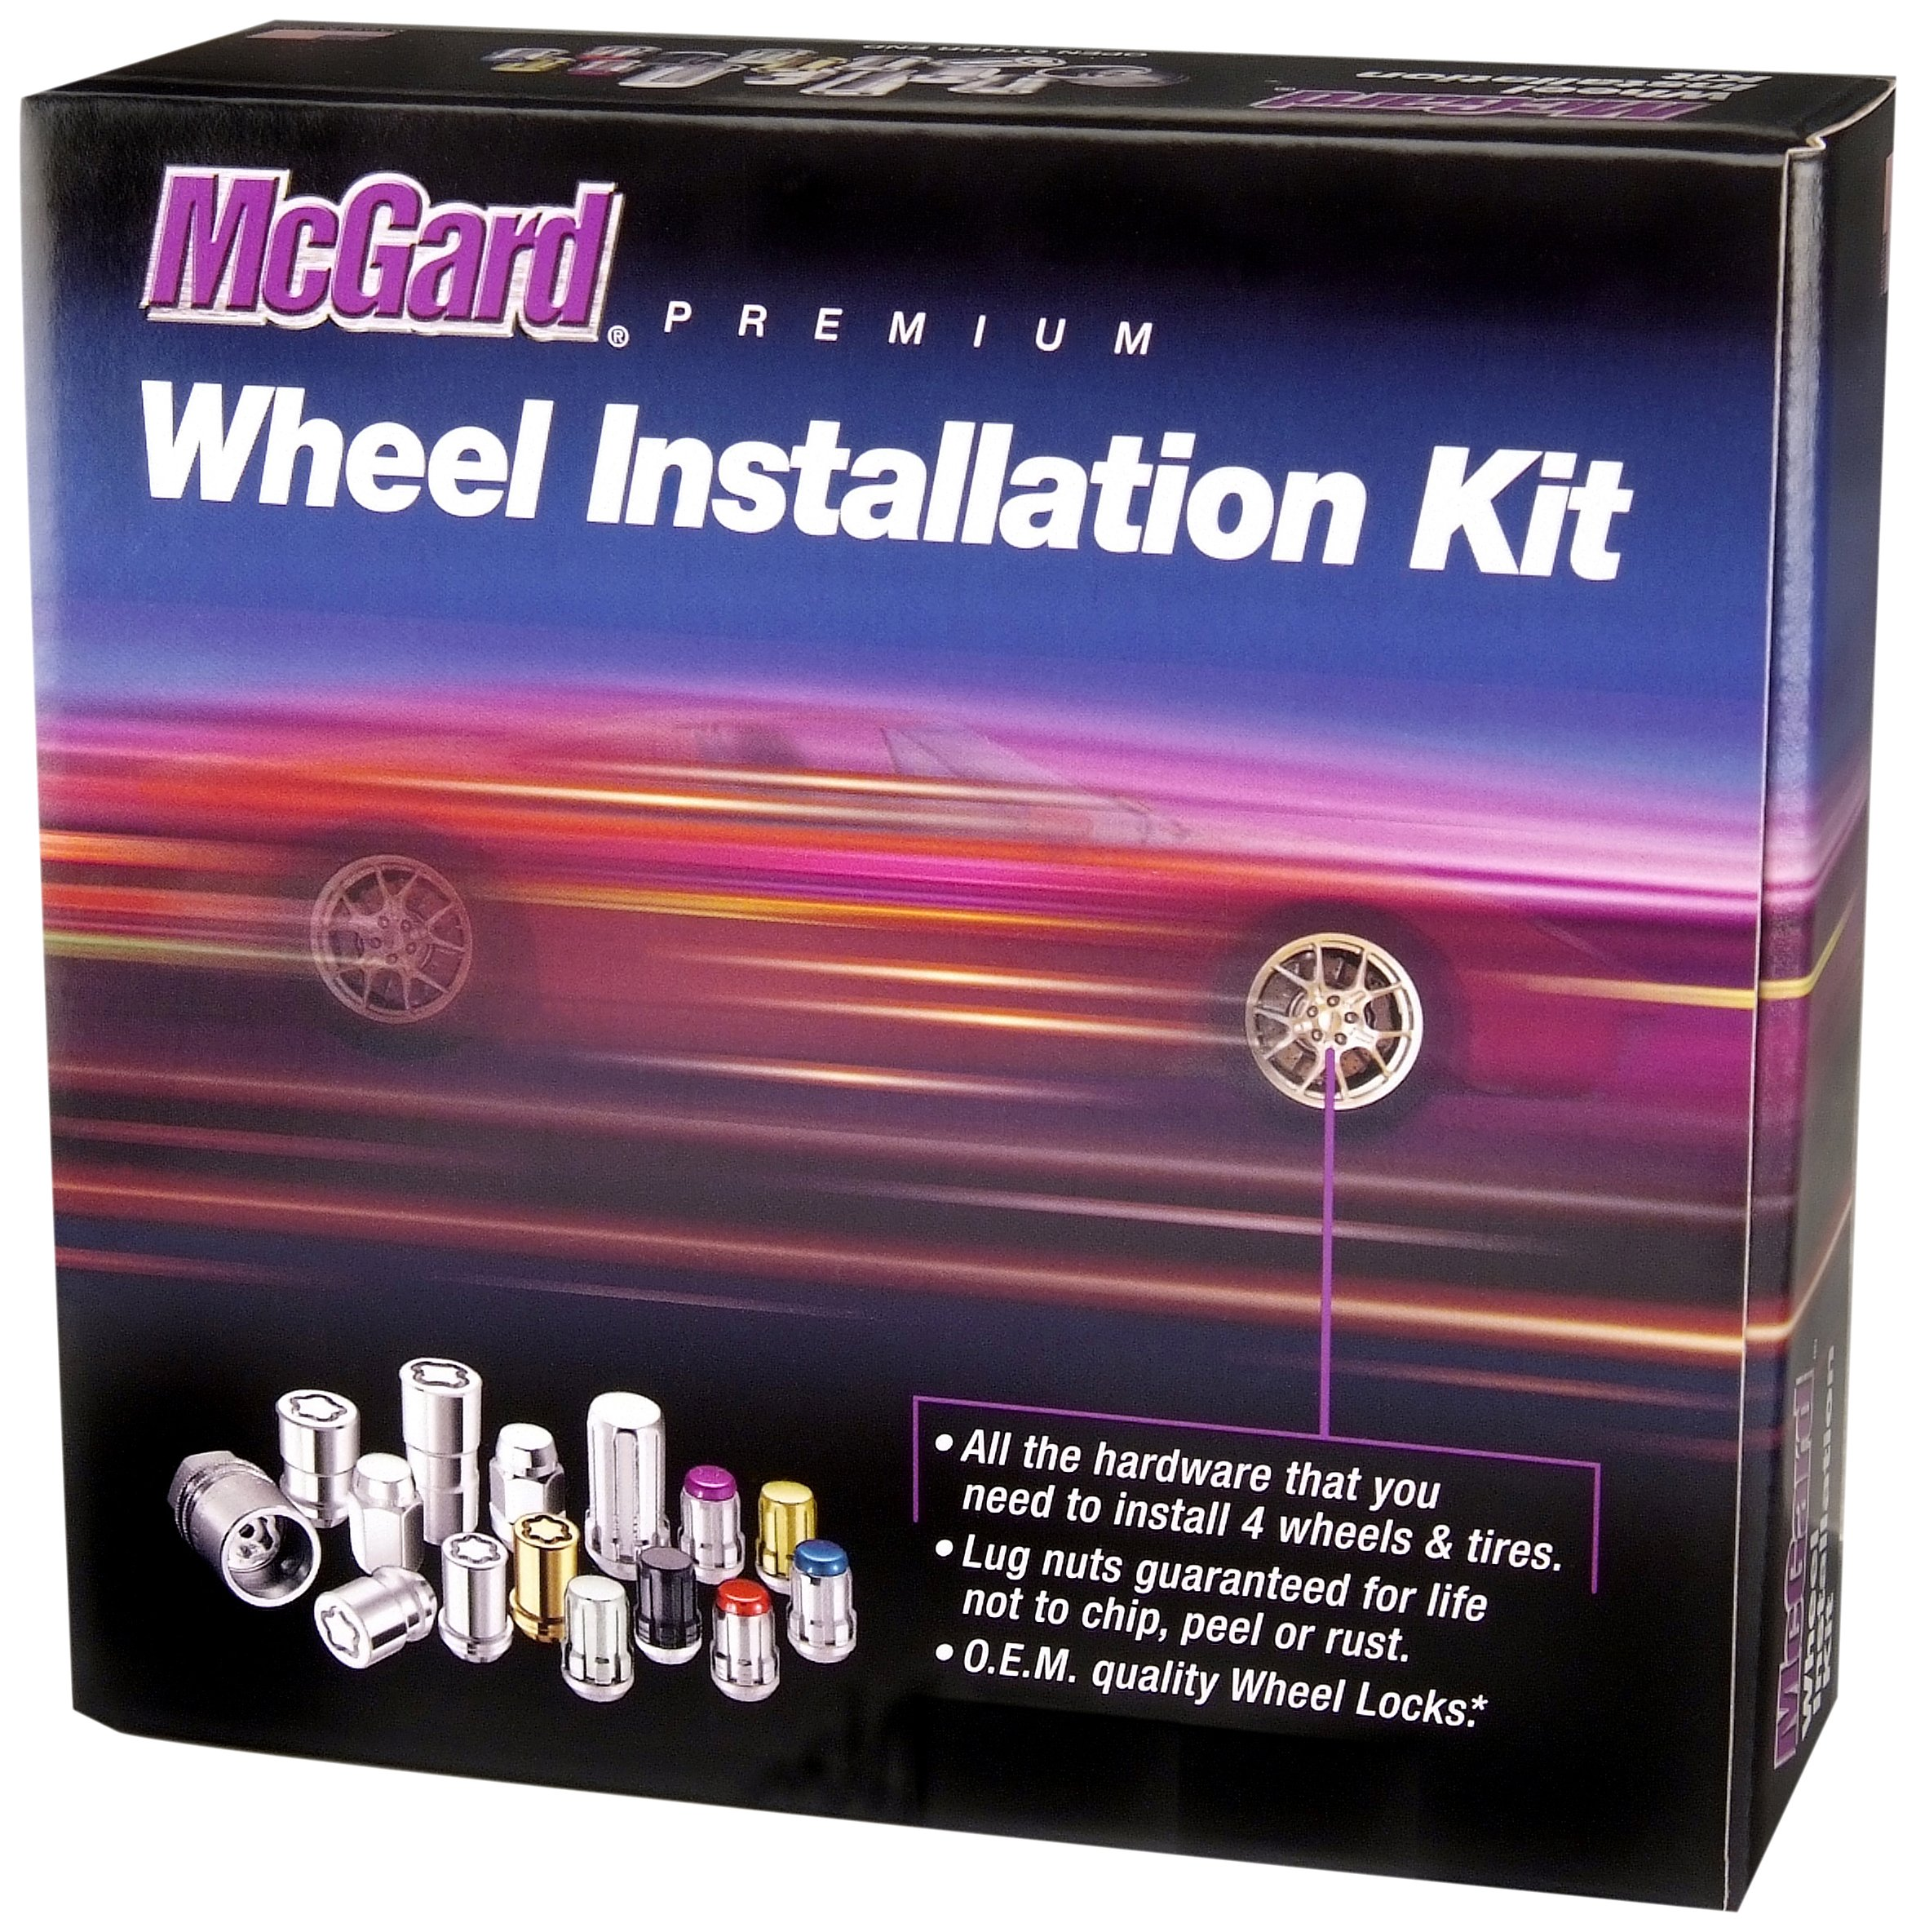 McGard 65515 Chrome Spline Drive 5 Lug Wheel Installation Kit